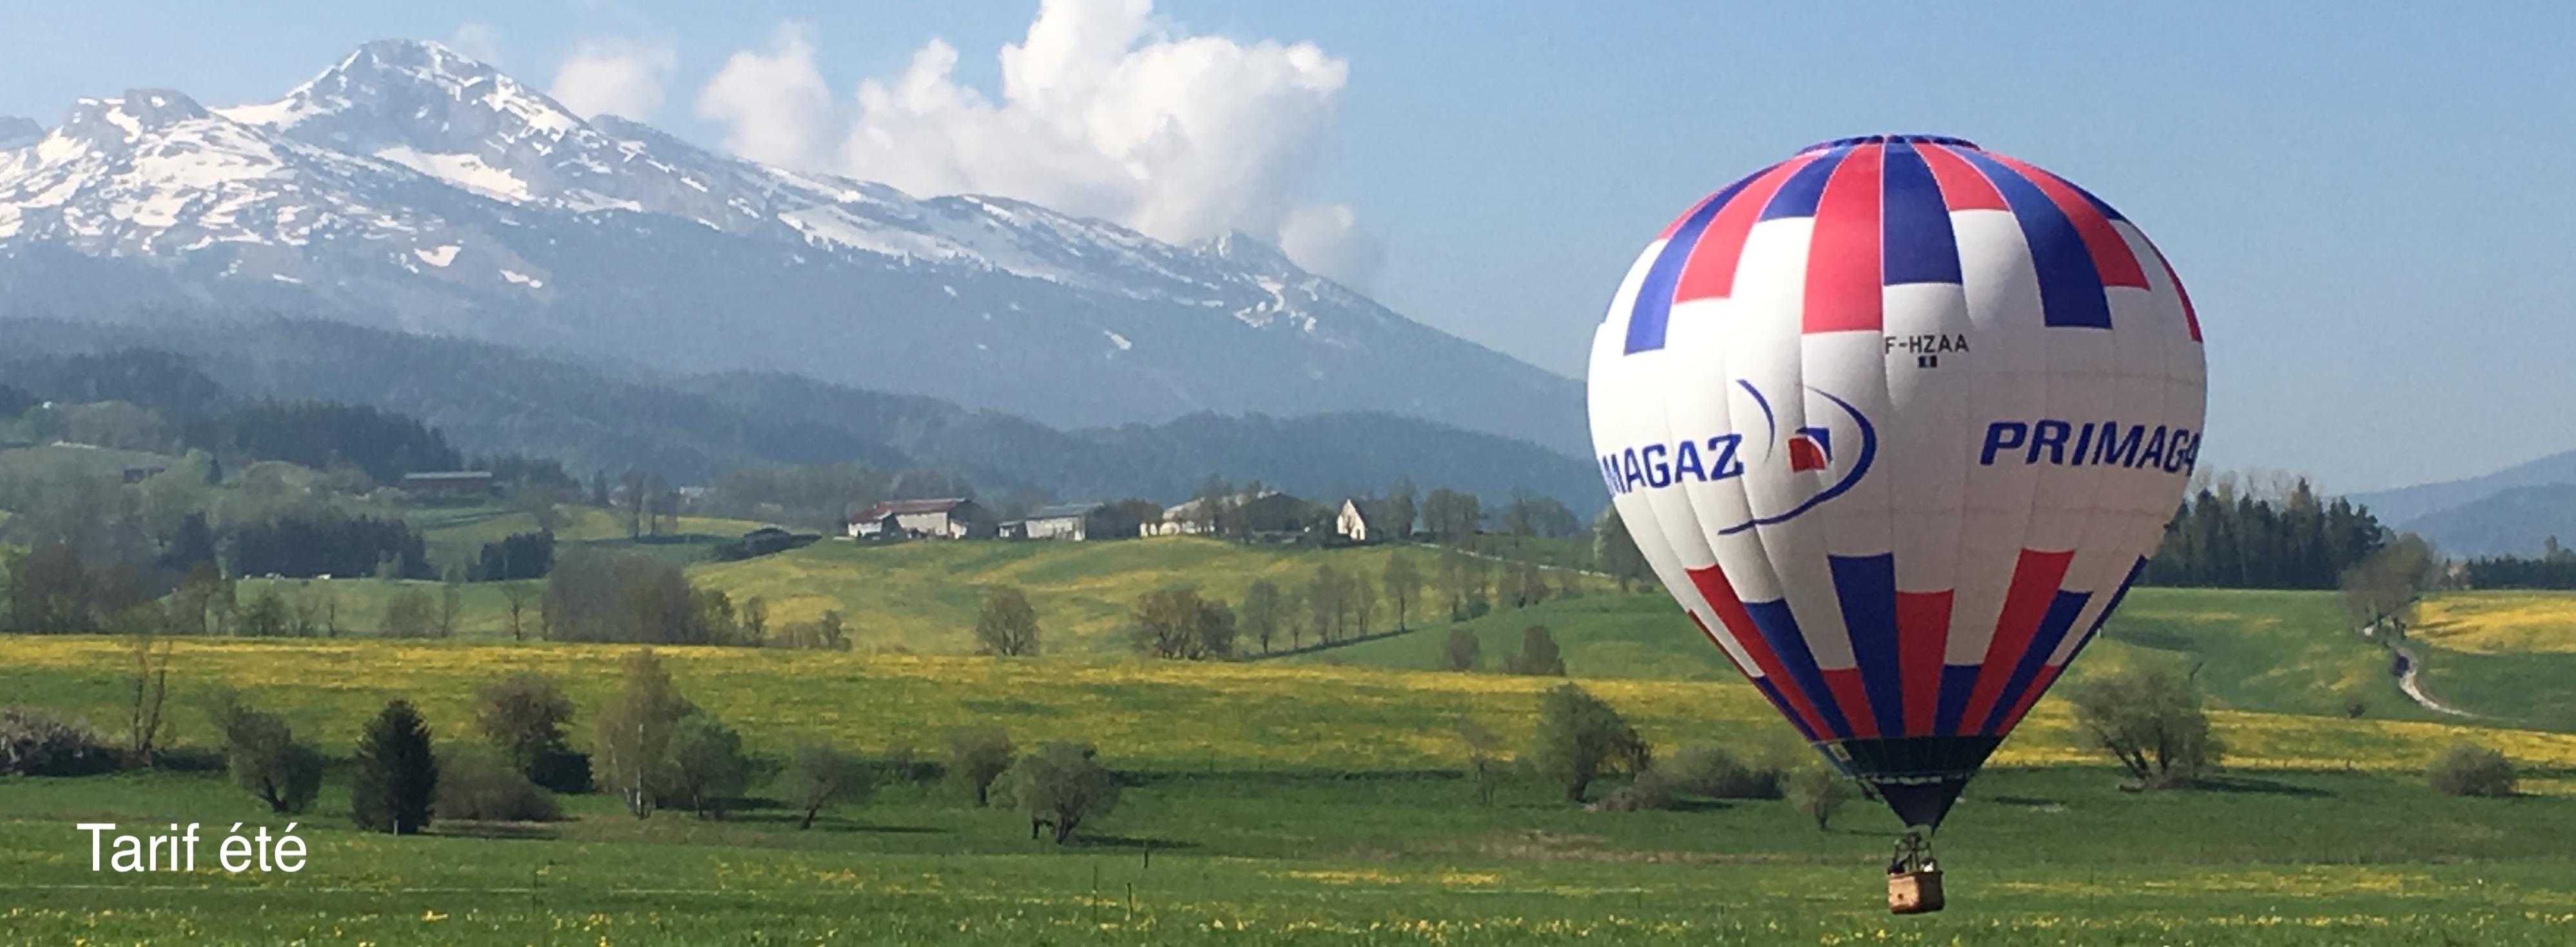 Heissluftballon in dem Val de Lans